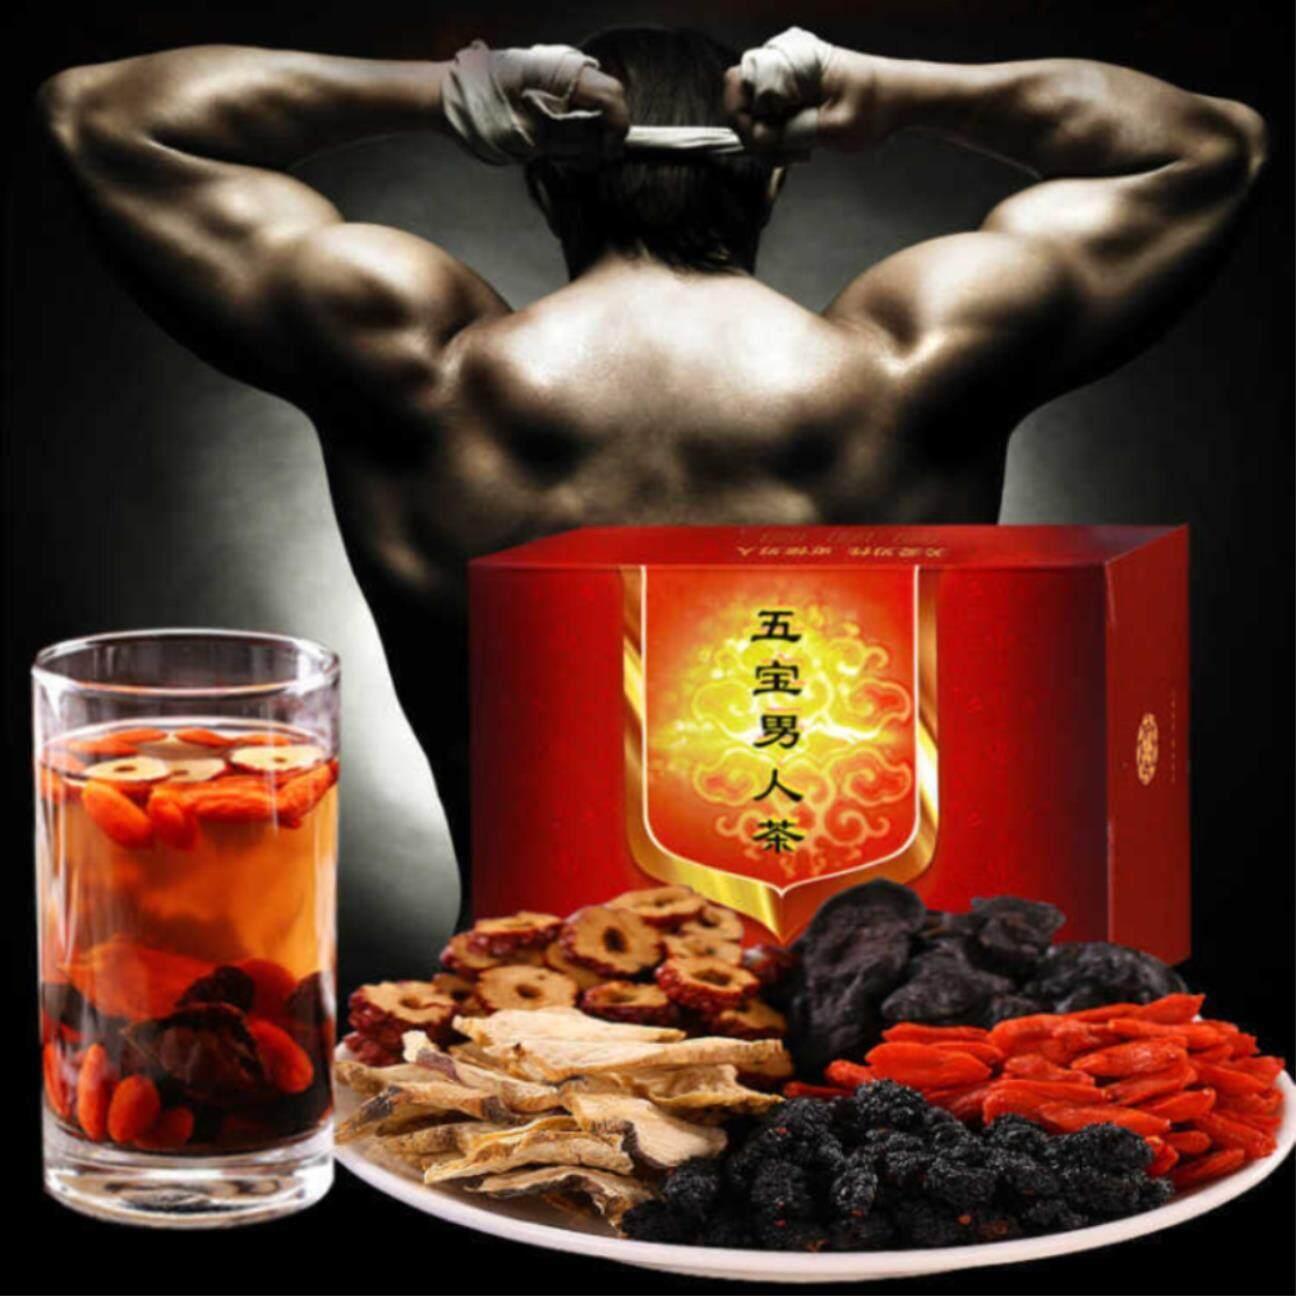 China Tea Five Treasures Tea Mens Tea Old Tea Kidney Tea Ginseng Tea Health Care Tea By Small Lovely Store.